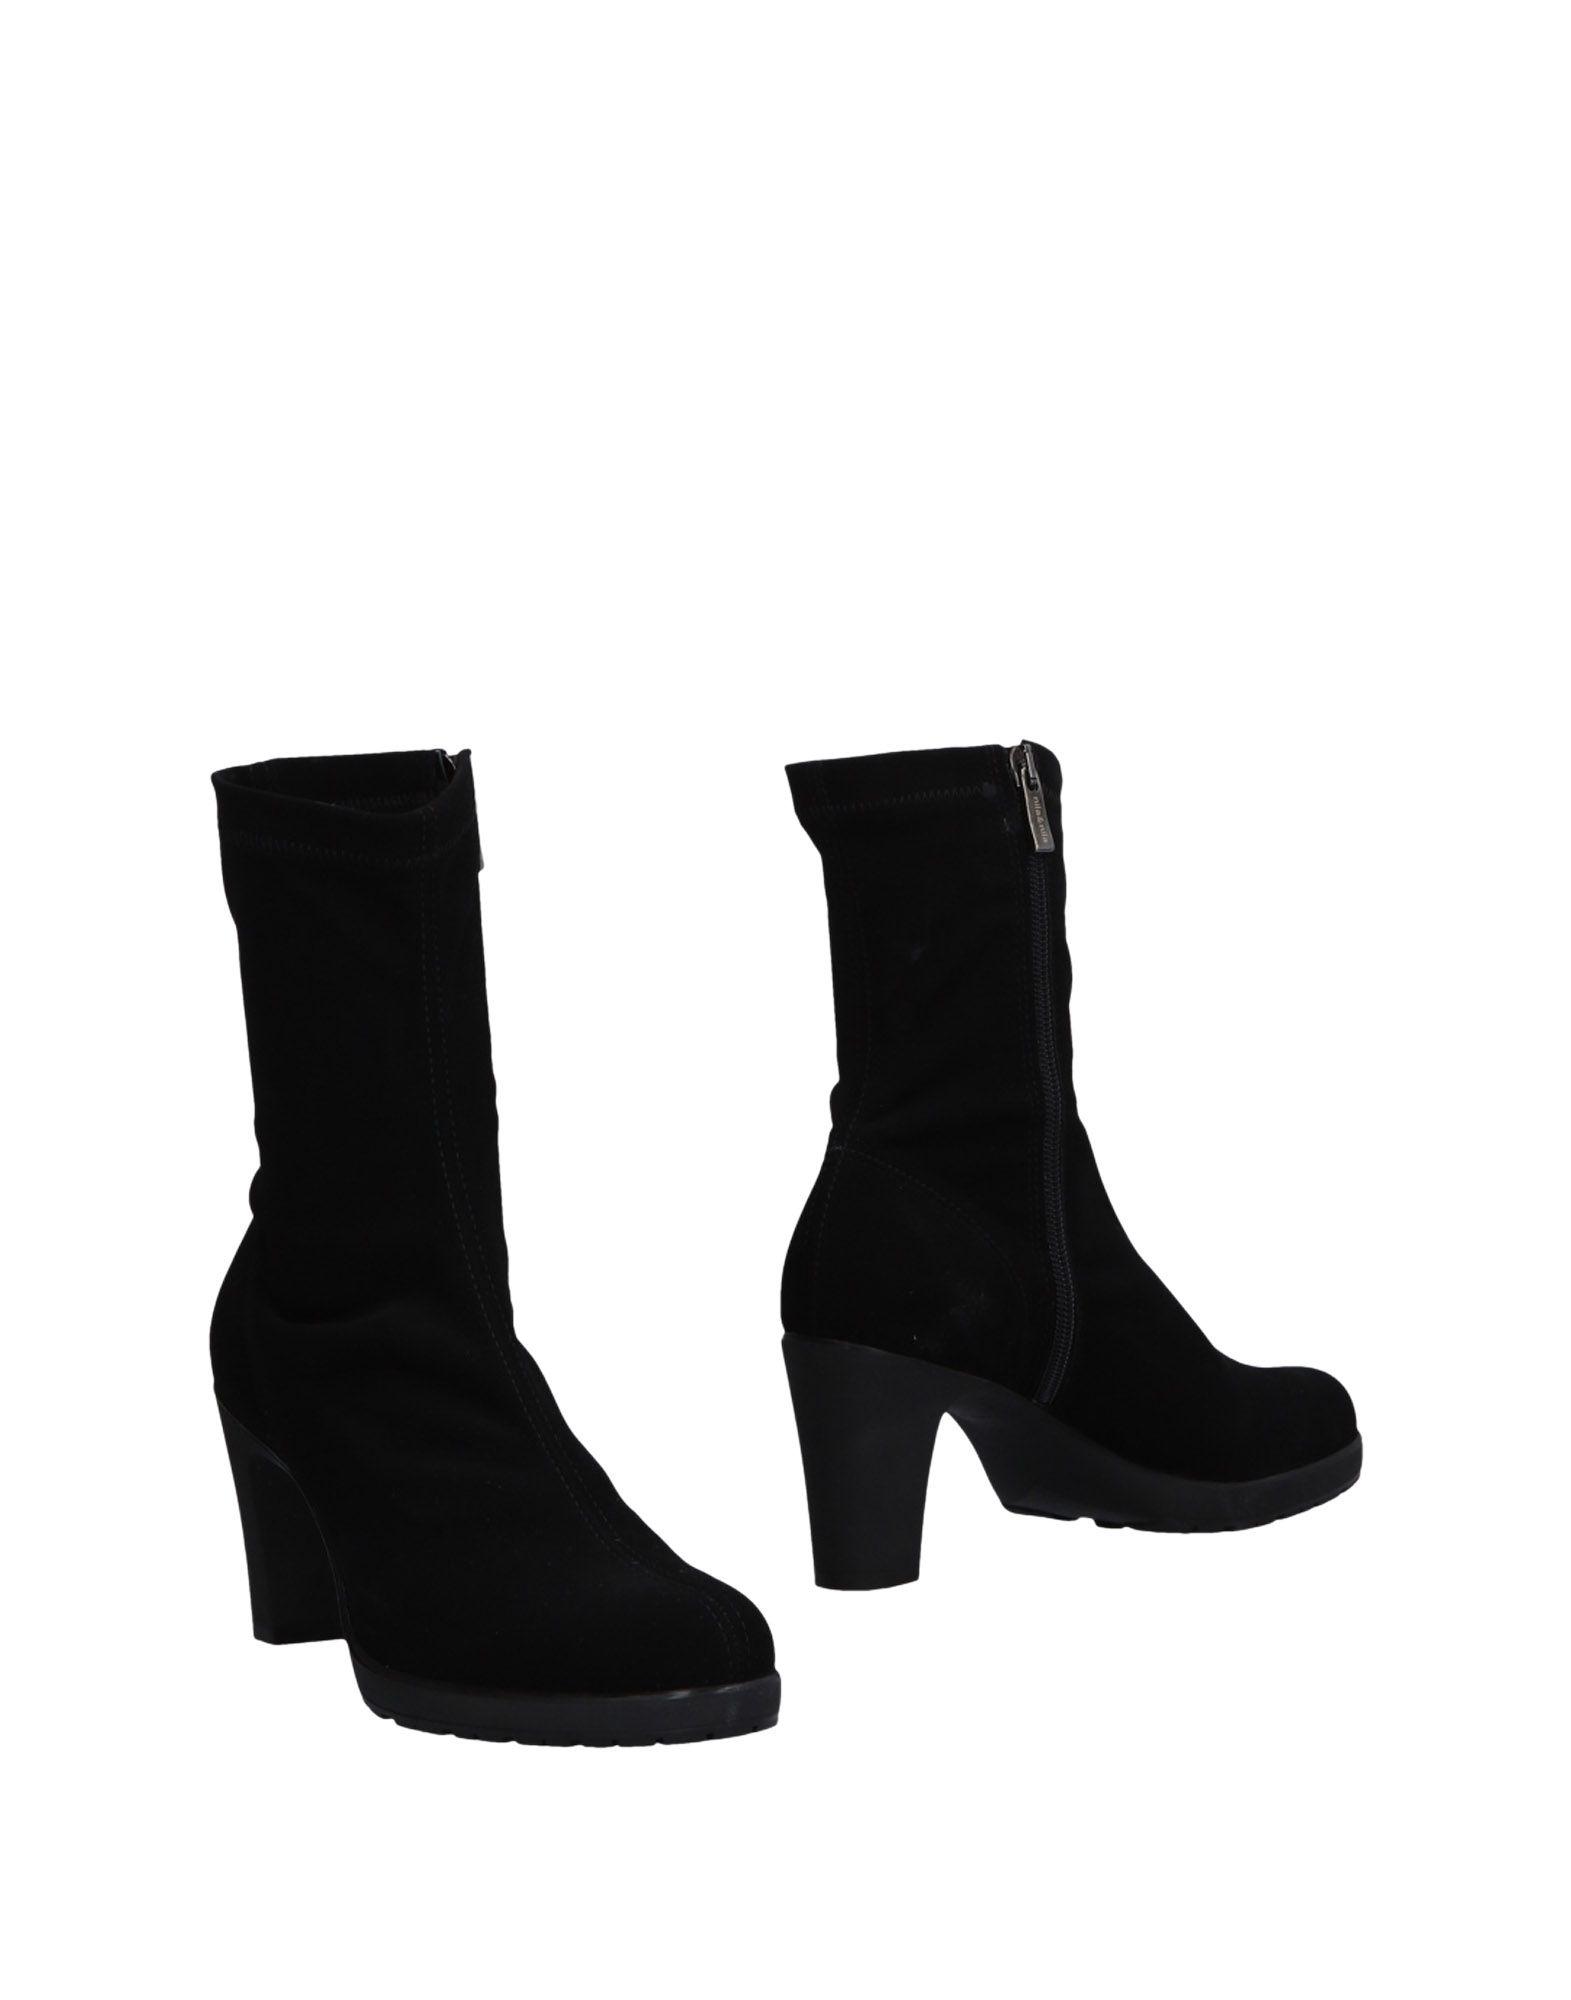 Nila & Nila Stiefelette Damen 11474980WH Gute Qualität beliebte Schuhe